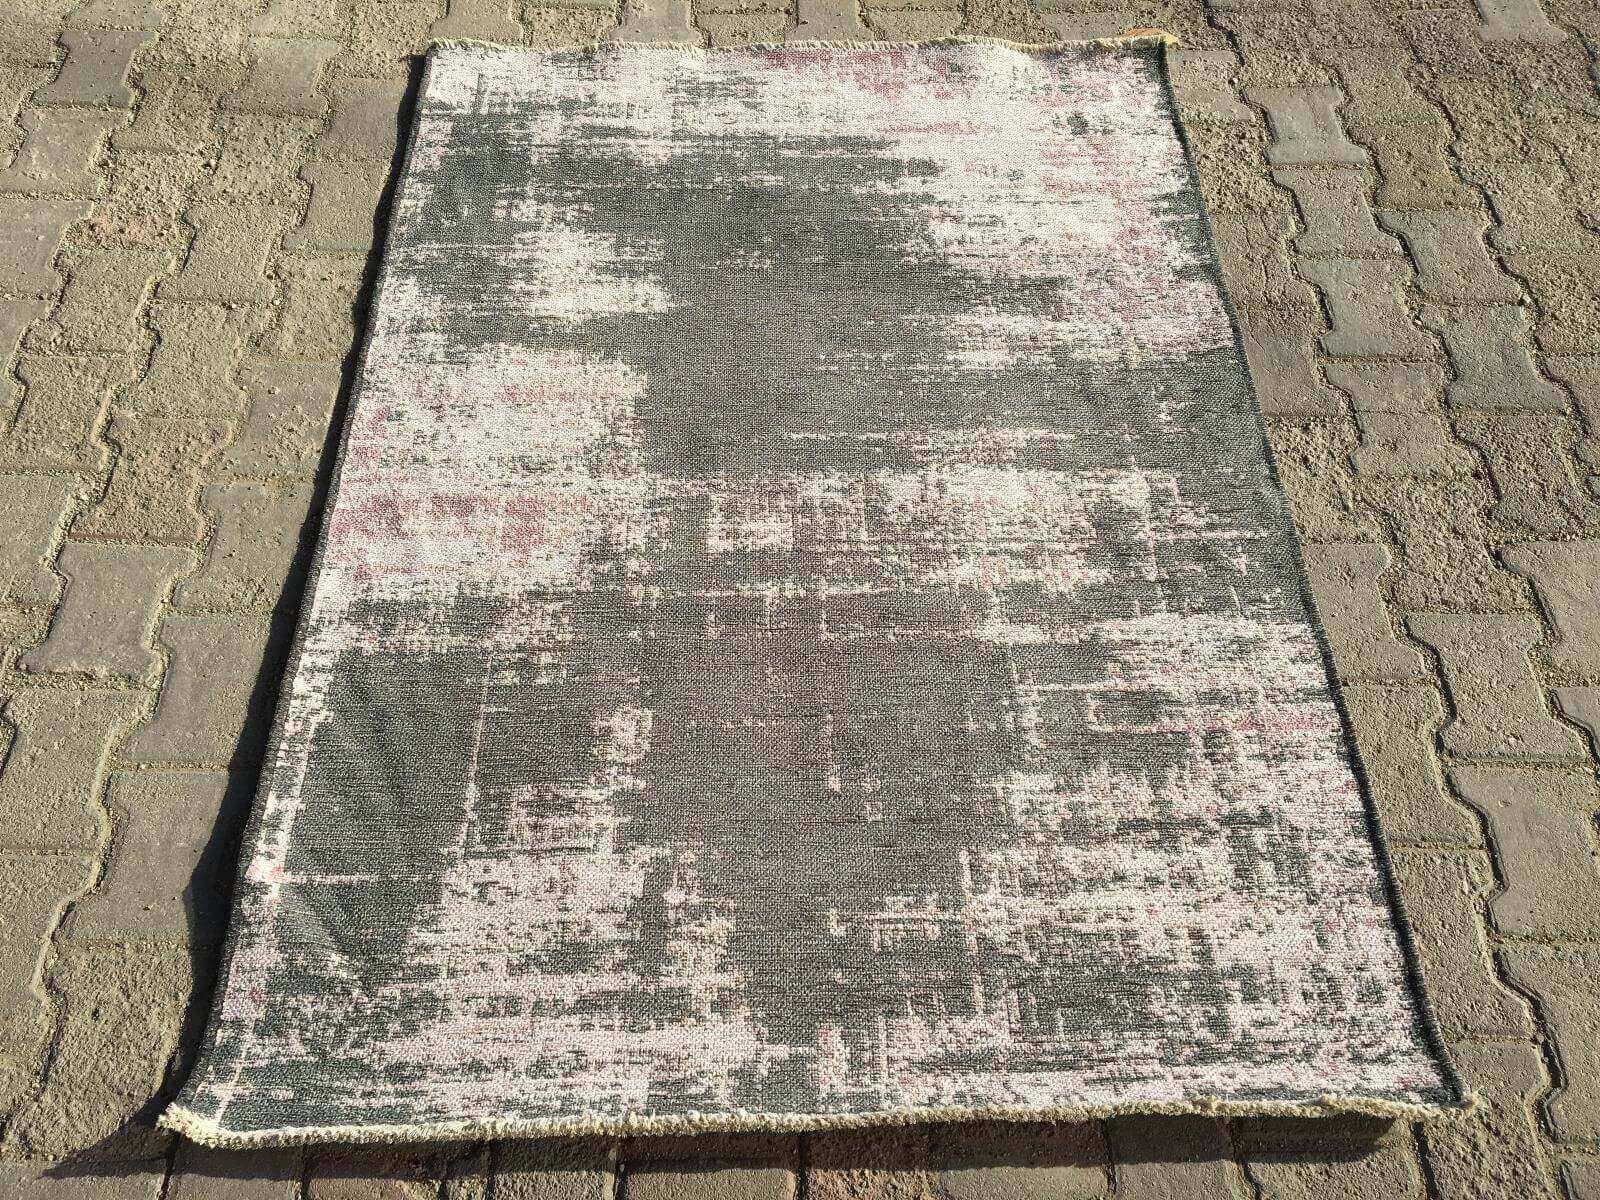 COTTON LÜX KİLİM GRİ LİLA 120X180 Cotton Lux Kilim Dekoratif Kilim